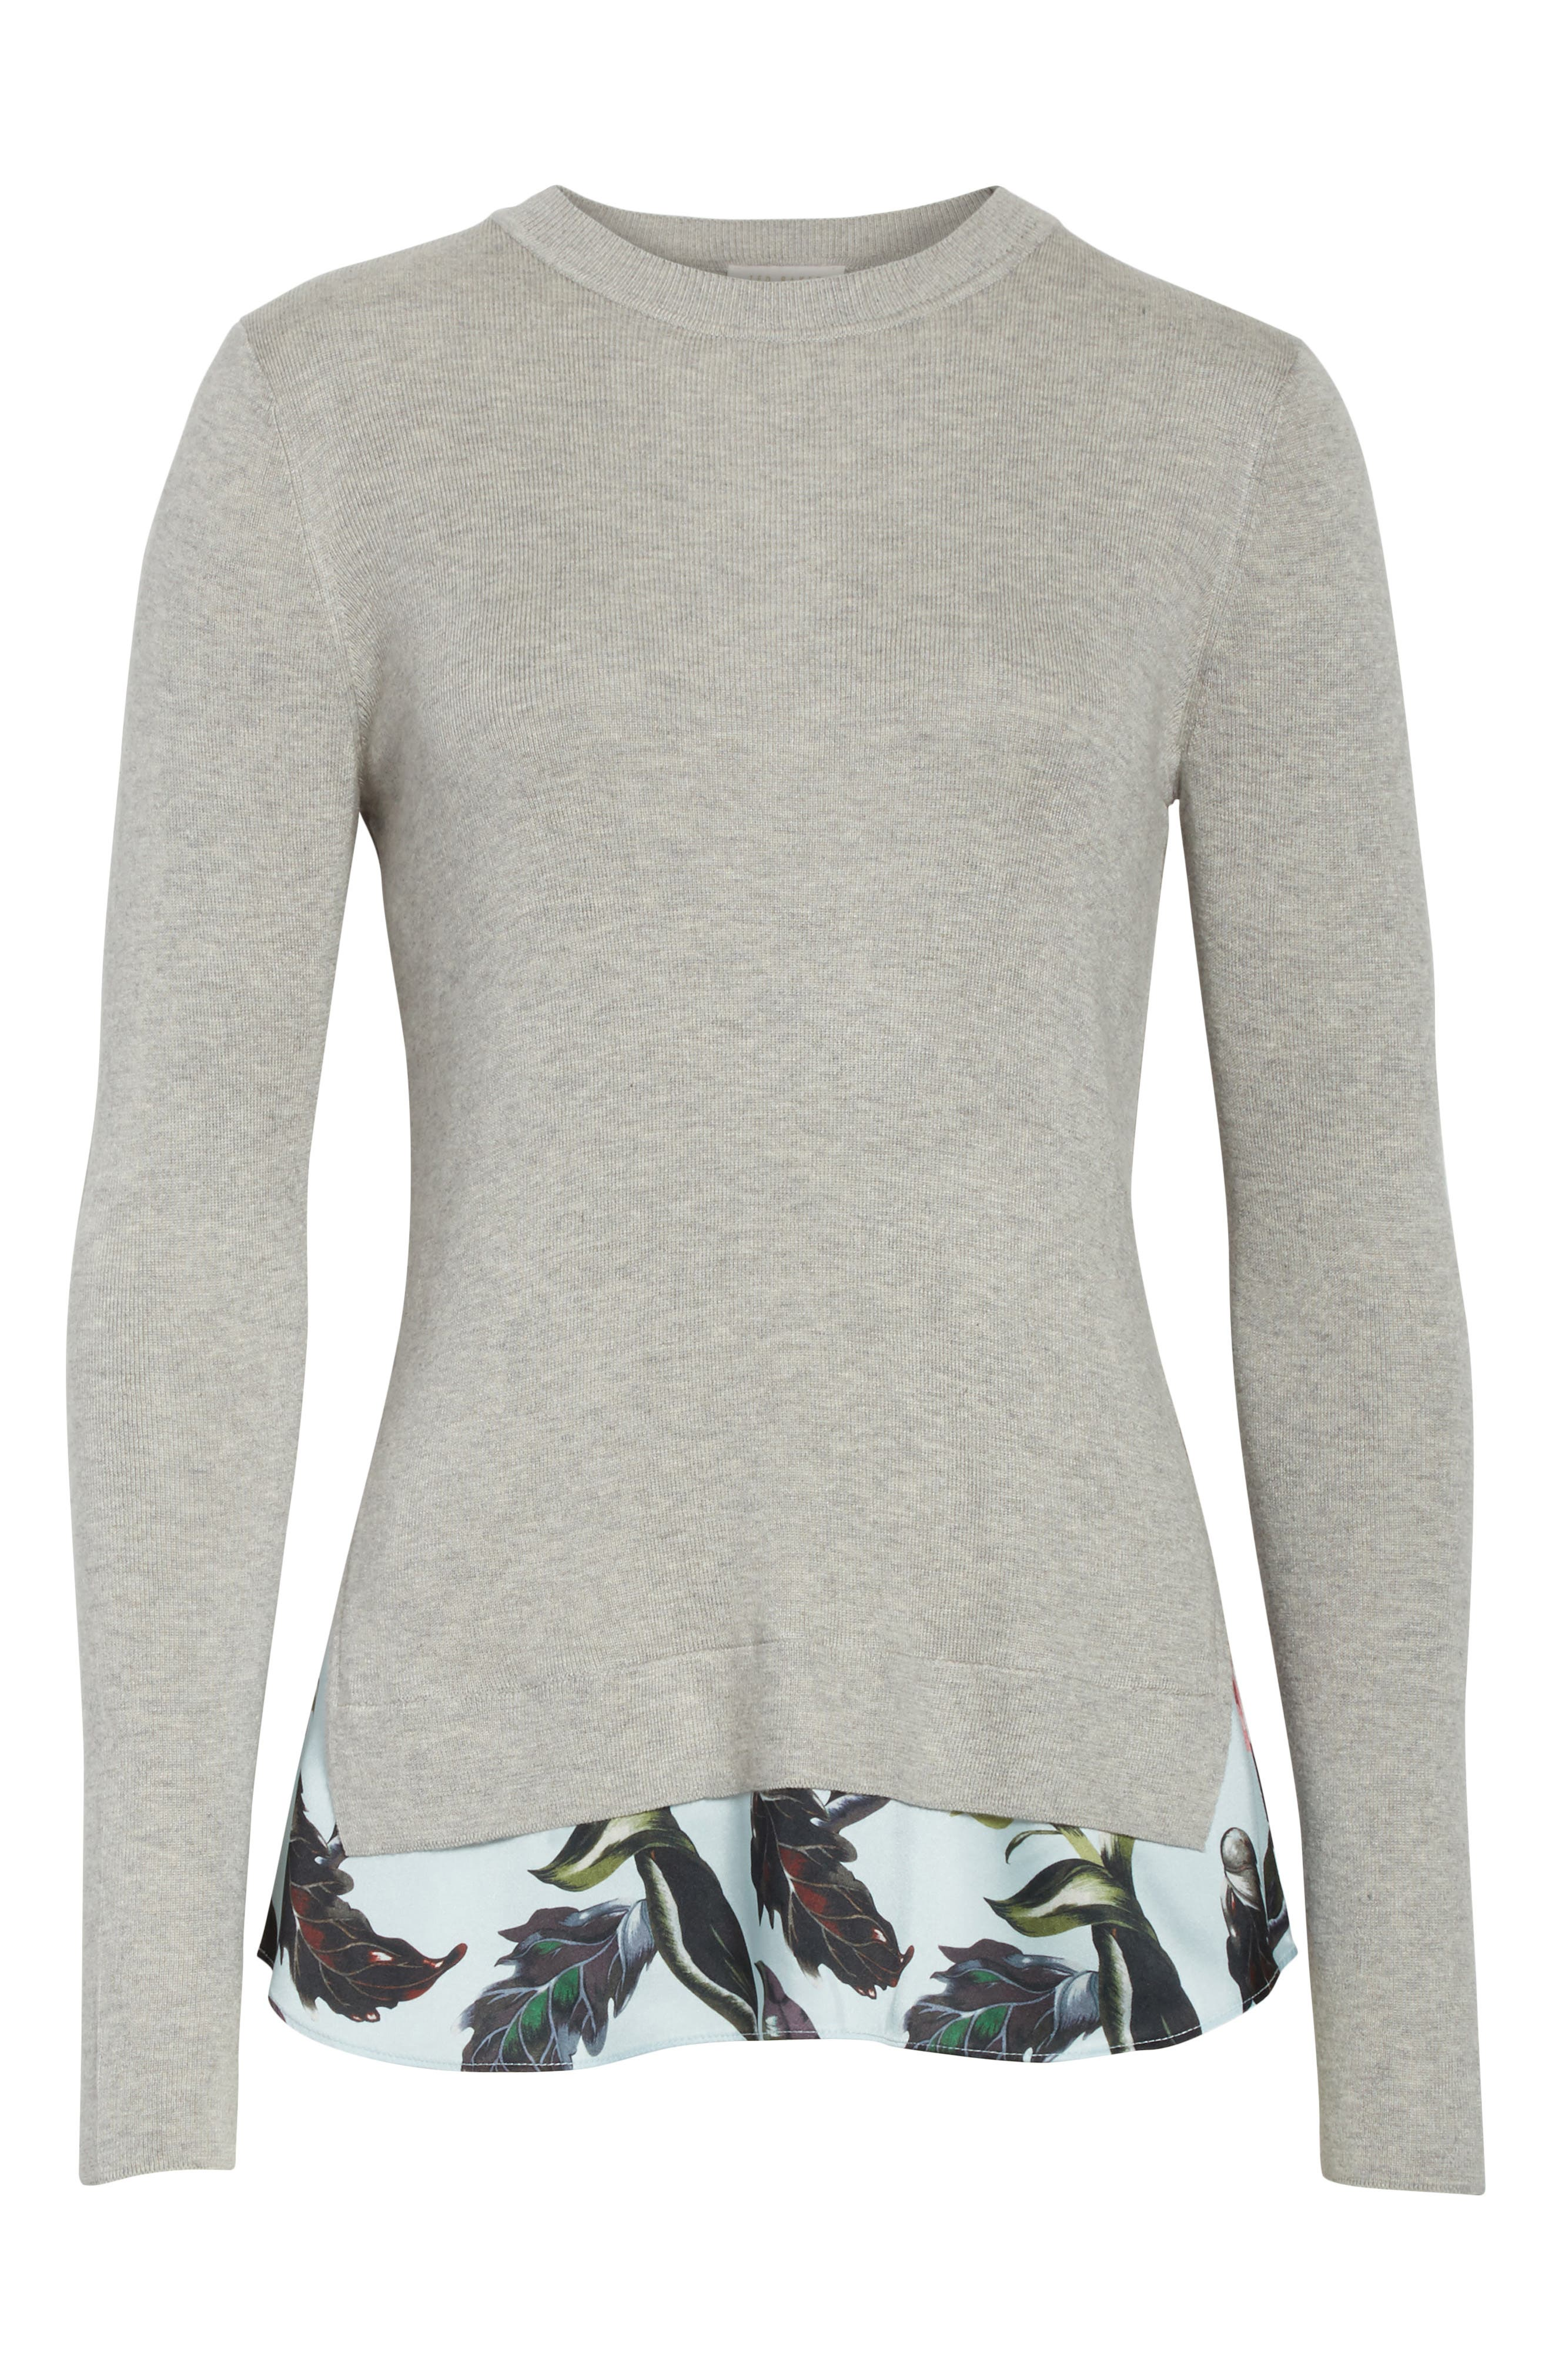 Karley Minerals Mockable Sweater,                             Alternate thumbnail 6, color,                             Light Grey